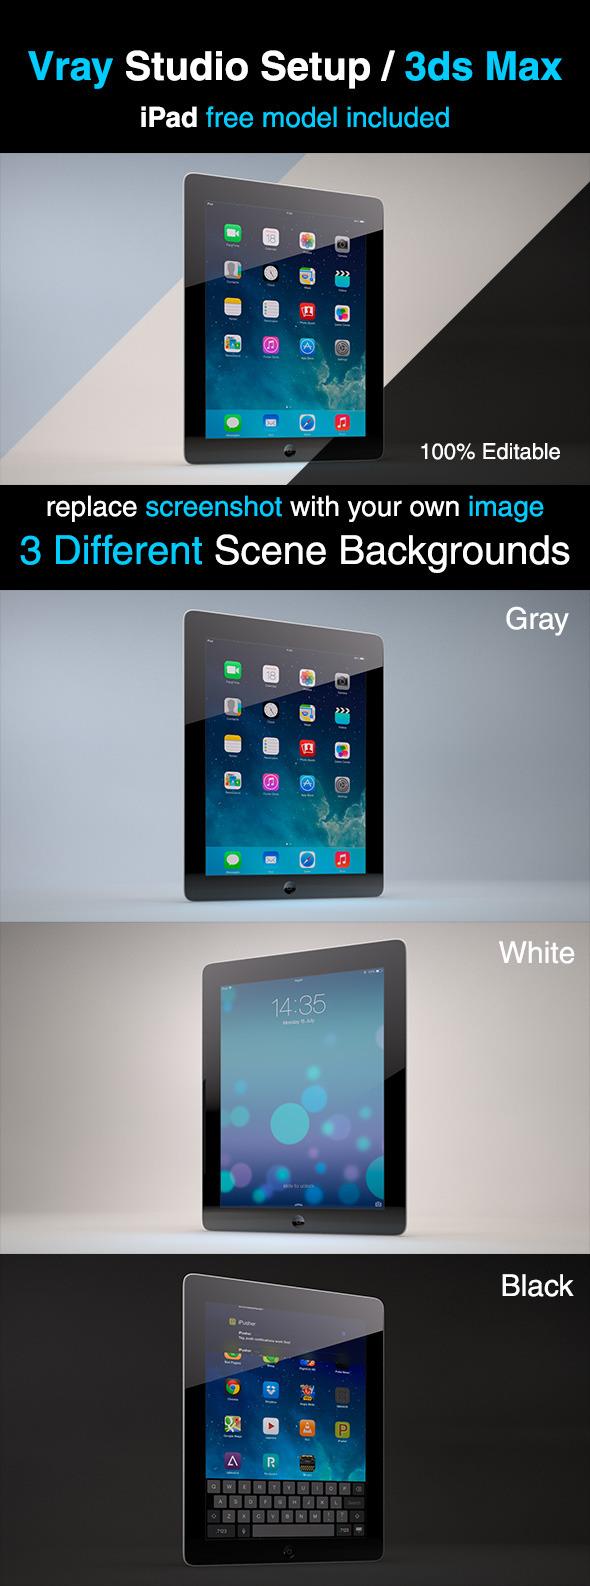 V-ray Studio Lighting Setup + iPad Model - 3DOcean Item for Sale